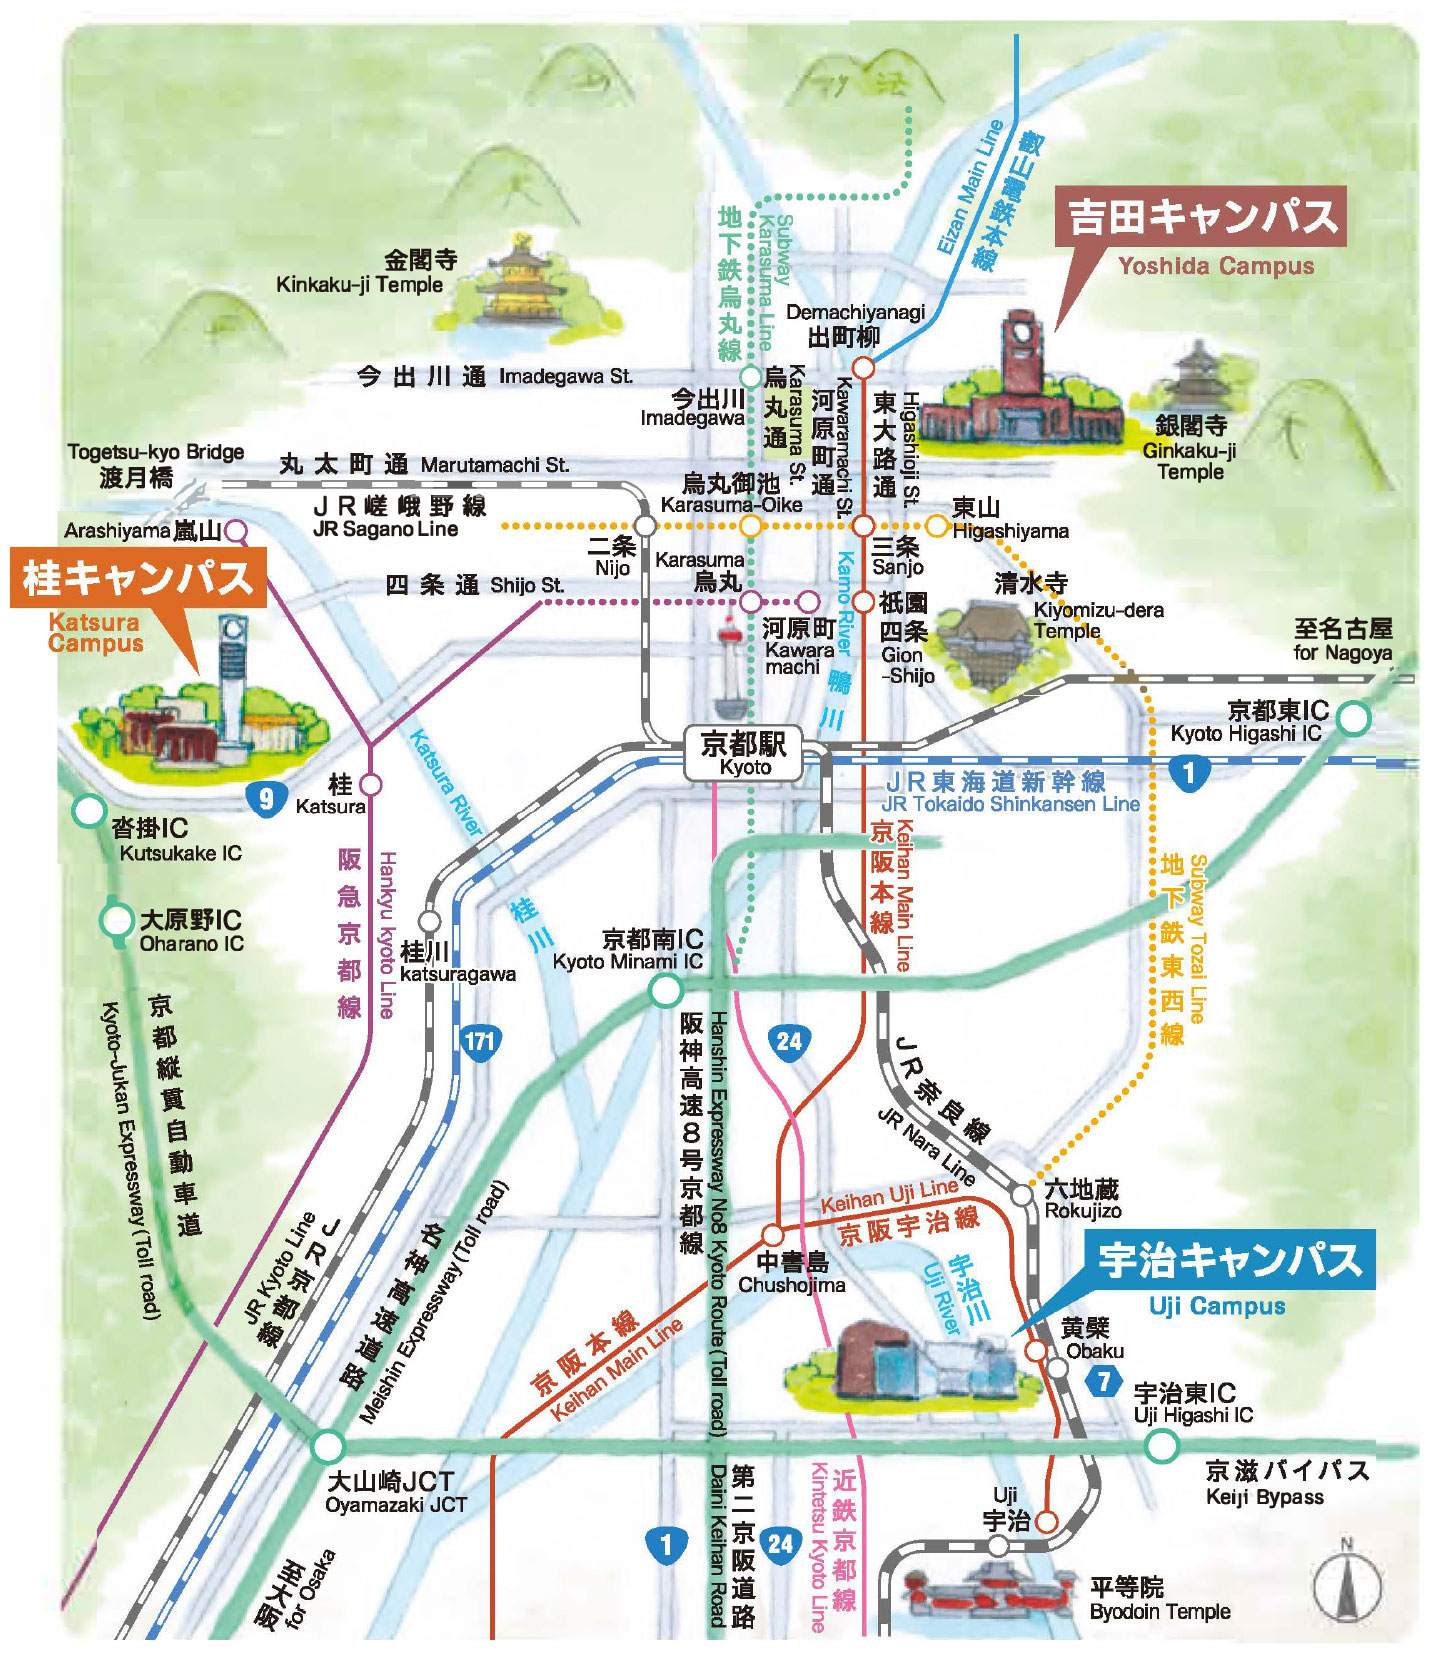 katsura_map_京都市内.jpg